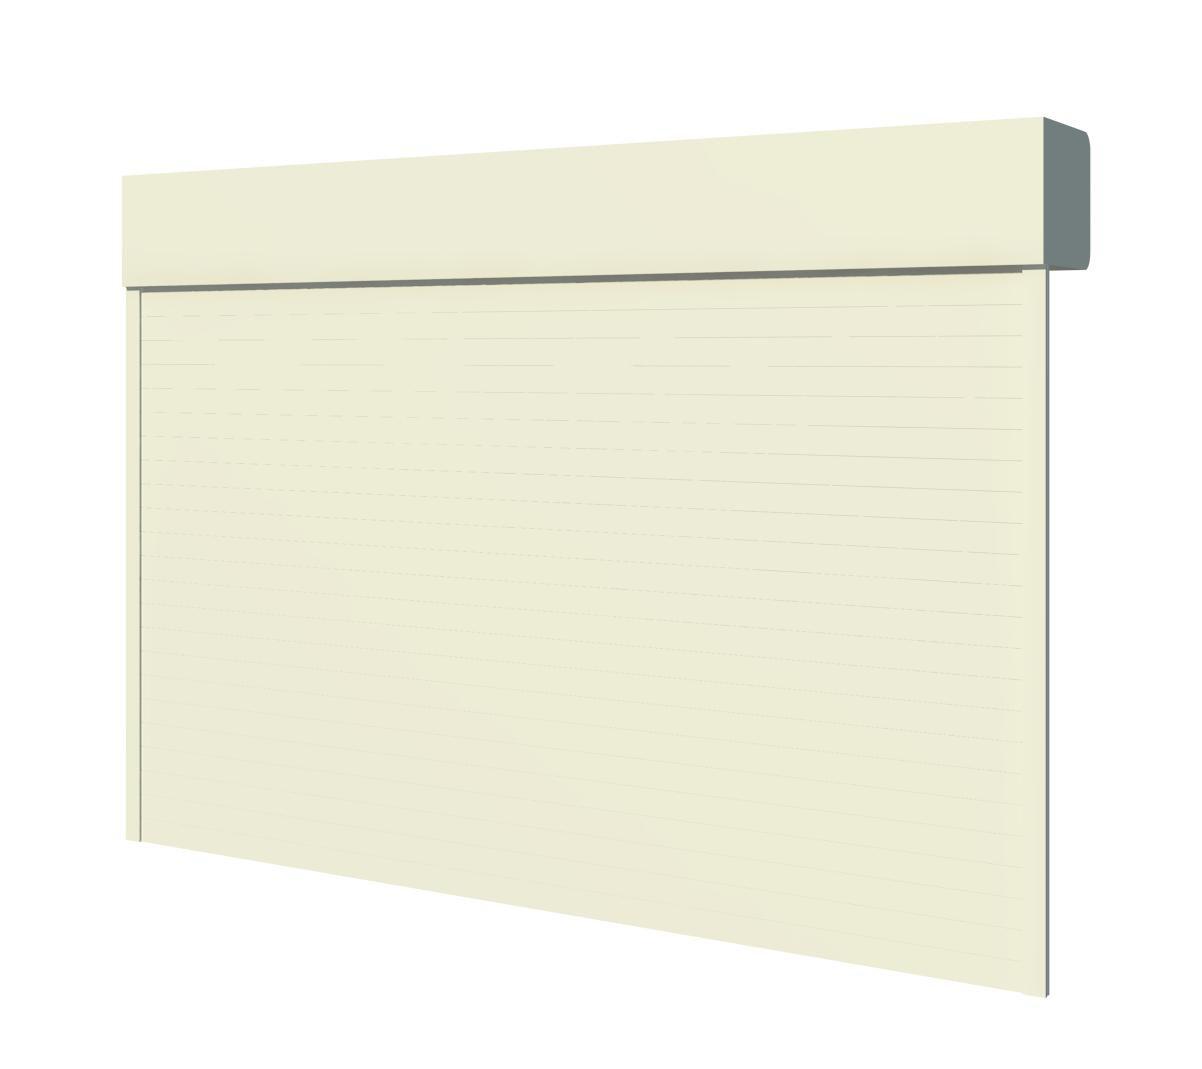 Puerta enrollable collbaix para garajes modelo master for Garajes modelos